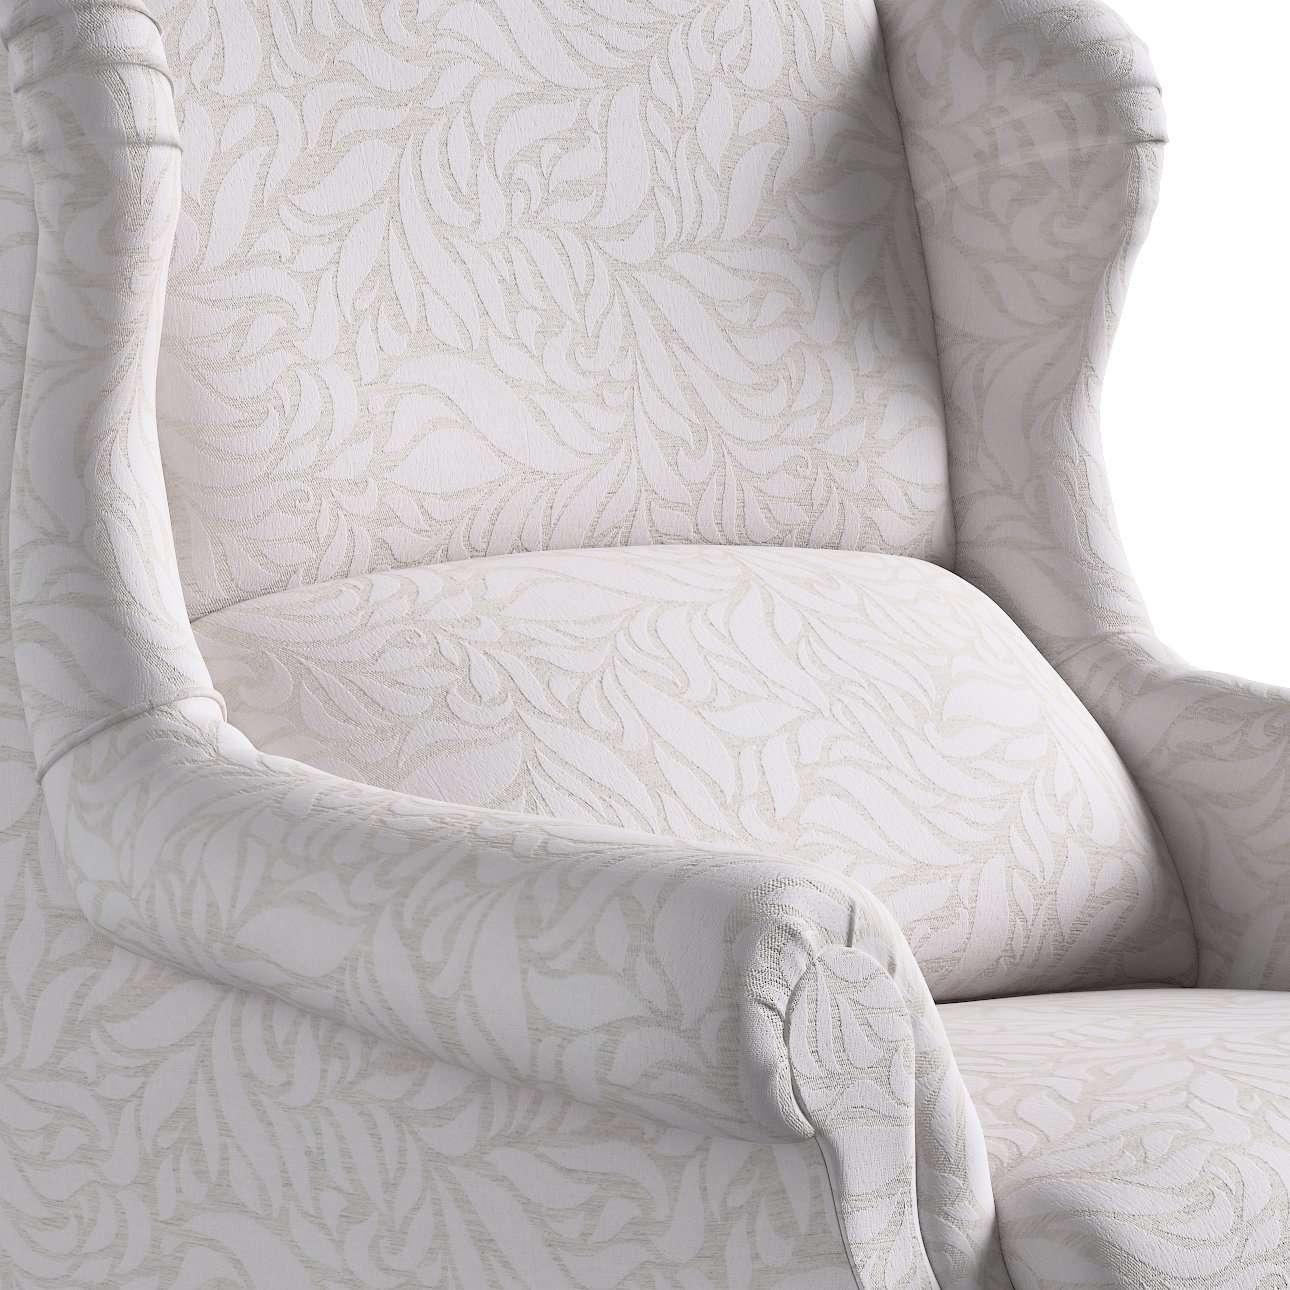 Fotel Unique w kolekcji Venice, tkanina: 140-50